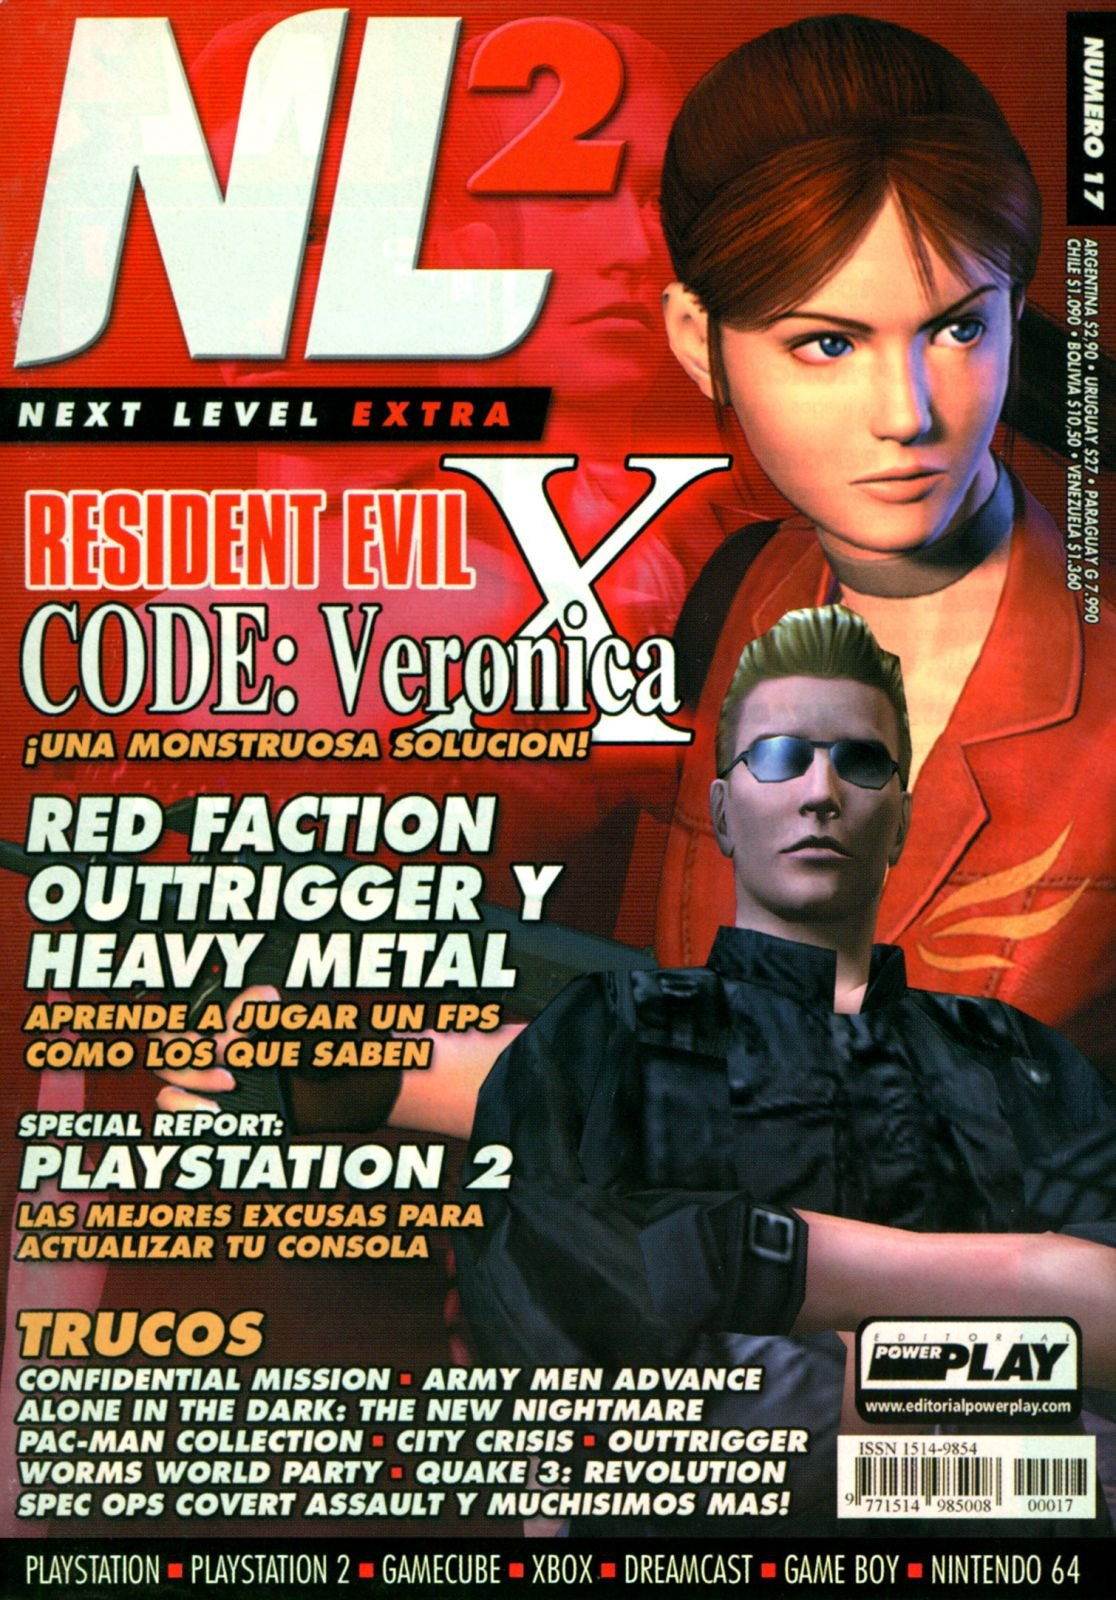 Next Level Extra 17 September 2001